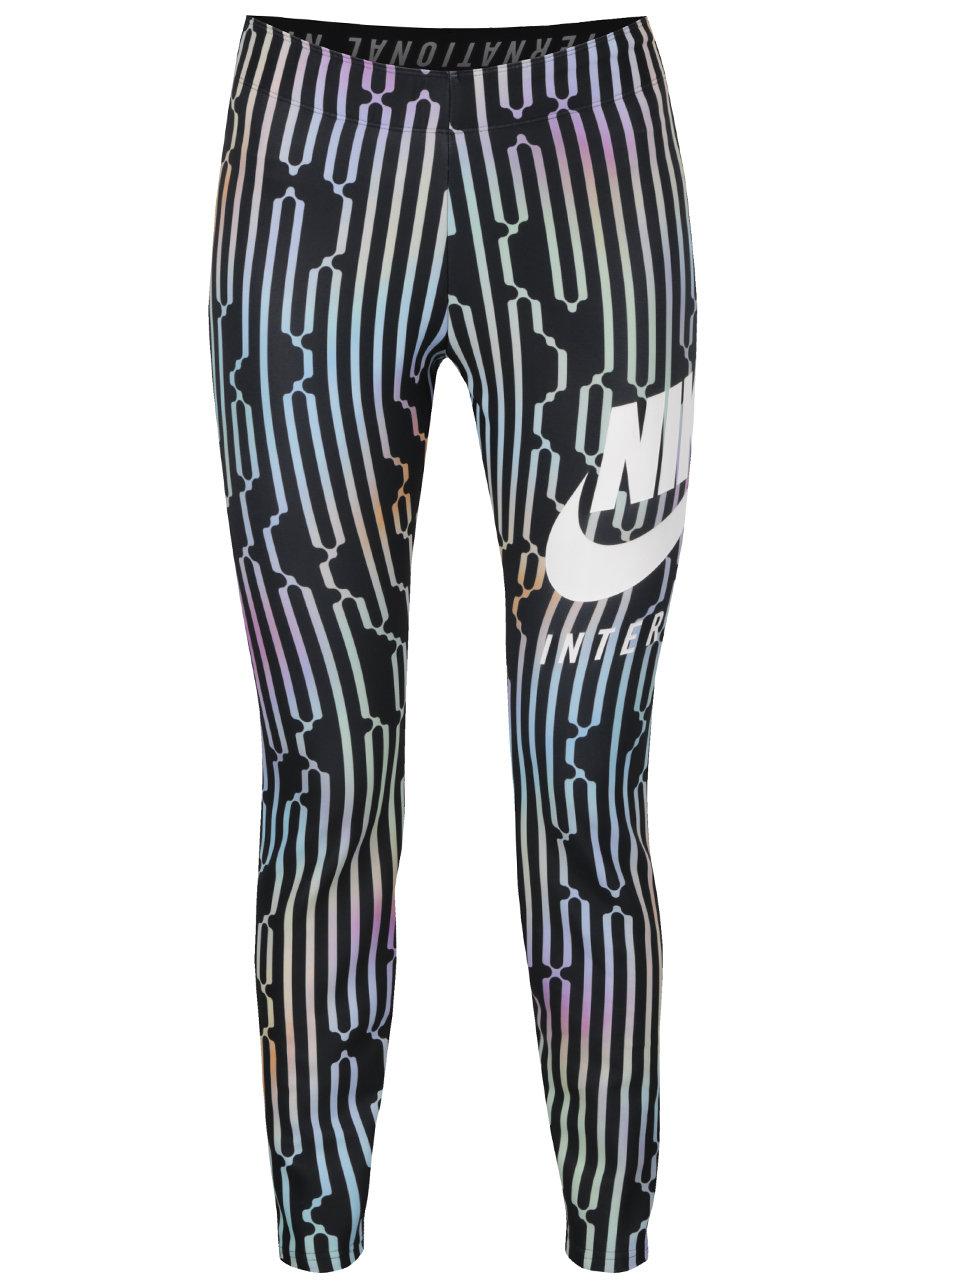 Černé vzorované dámské legíny Nike ... 5c8322926c